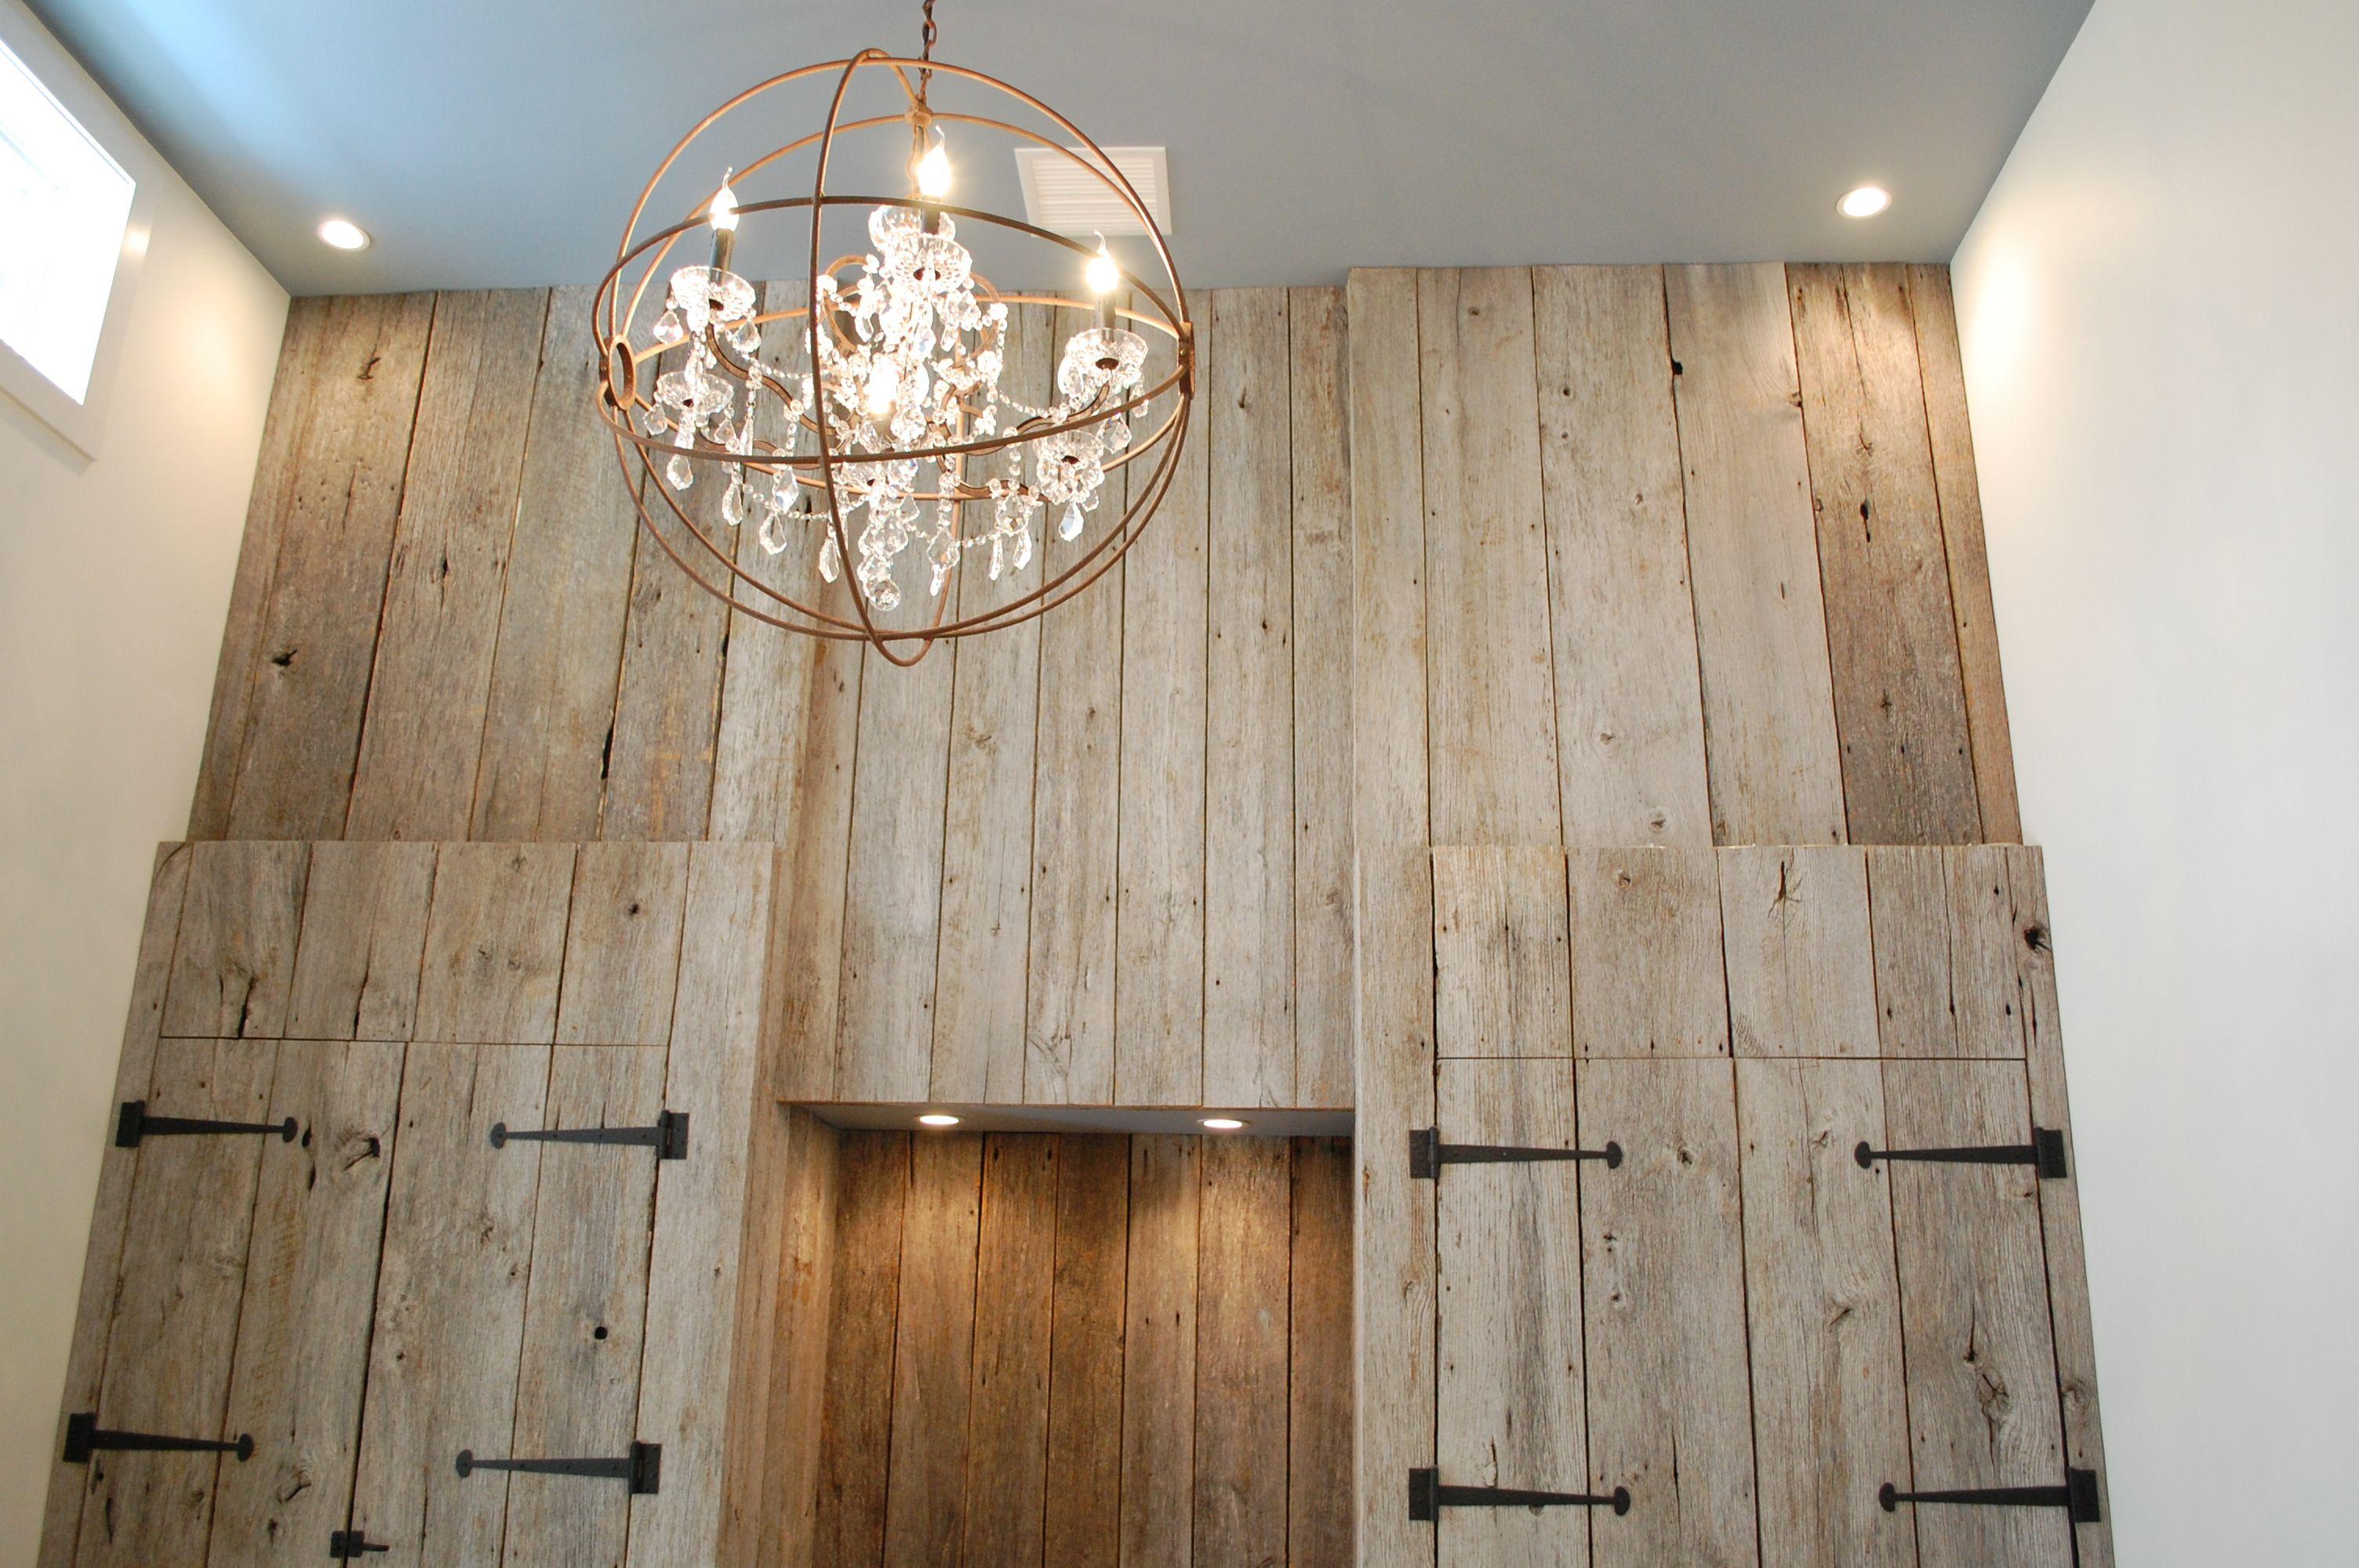 Interior design ideas using grey barn board with rustic - Farmhouse interior color schemes ...